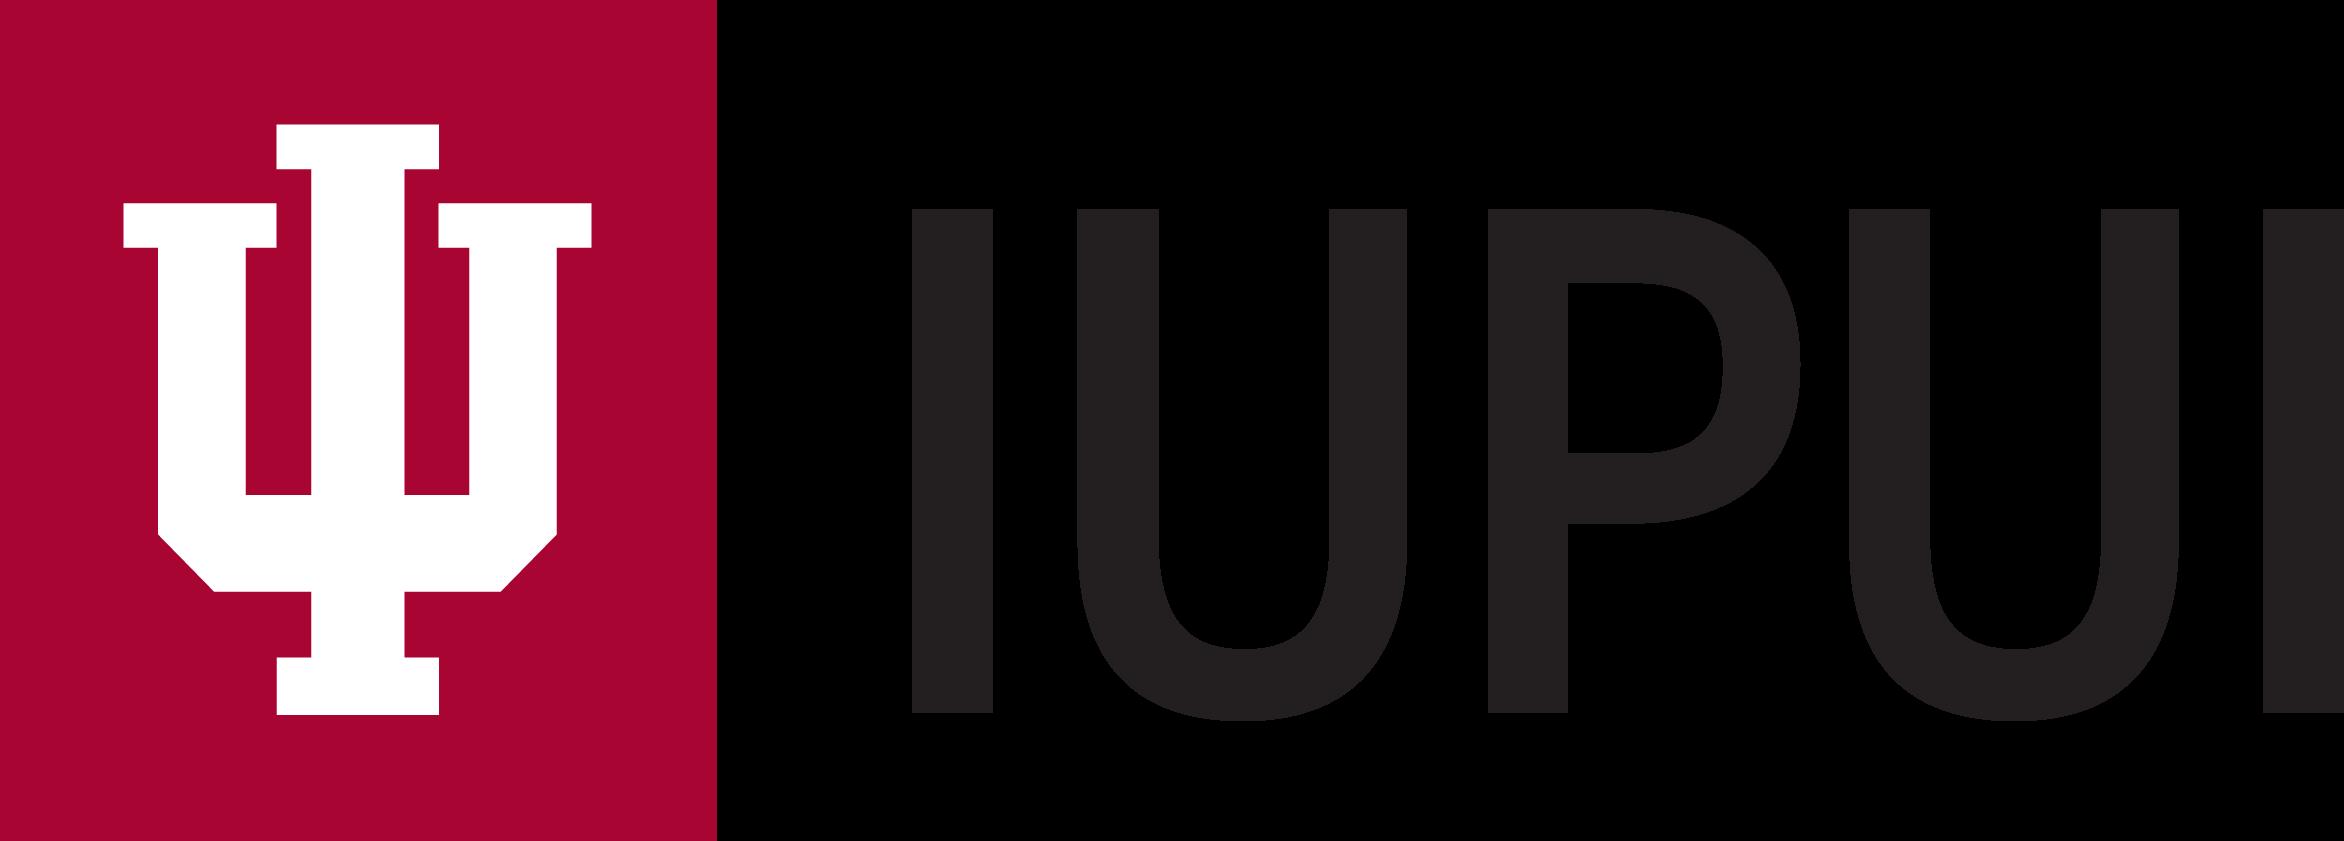 IUPUI-Horizontal-BlackText-Print.png